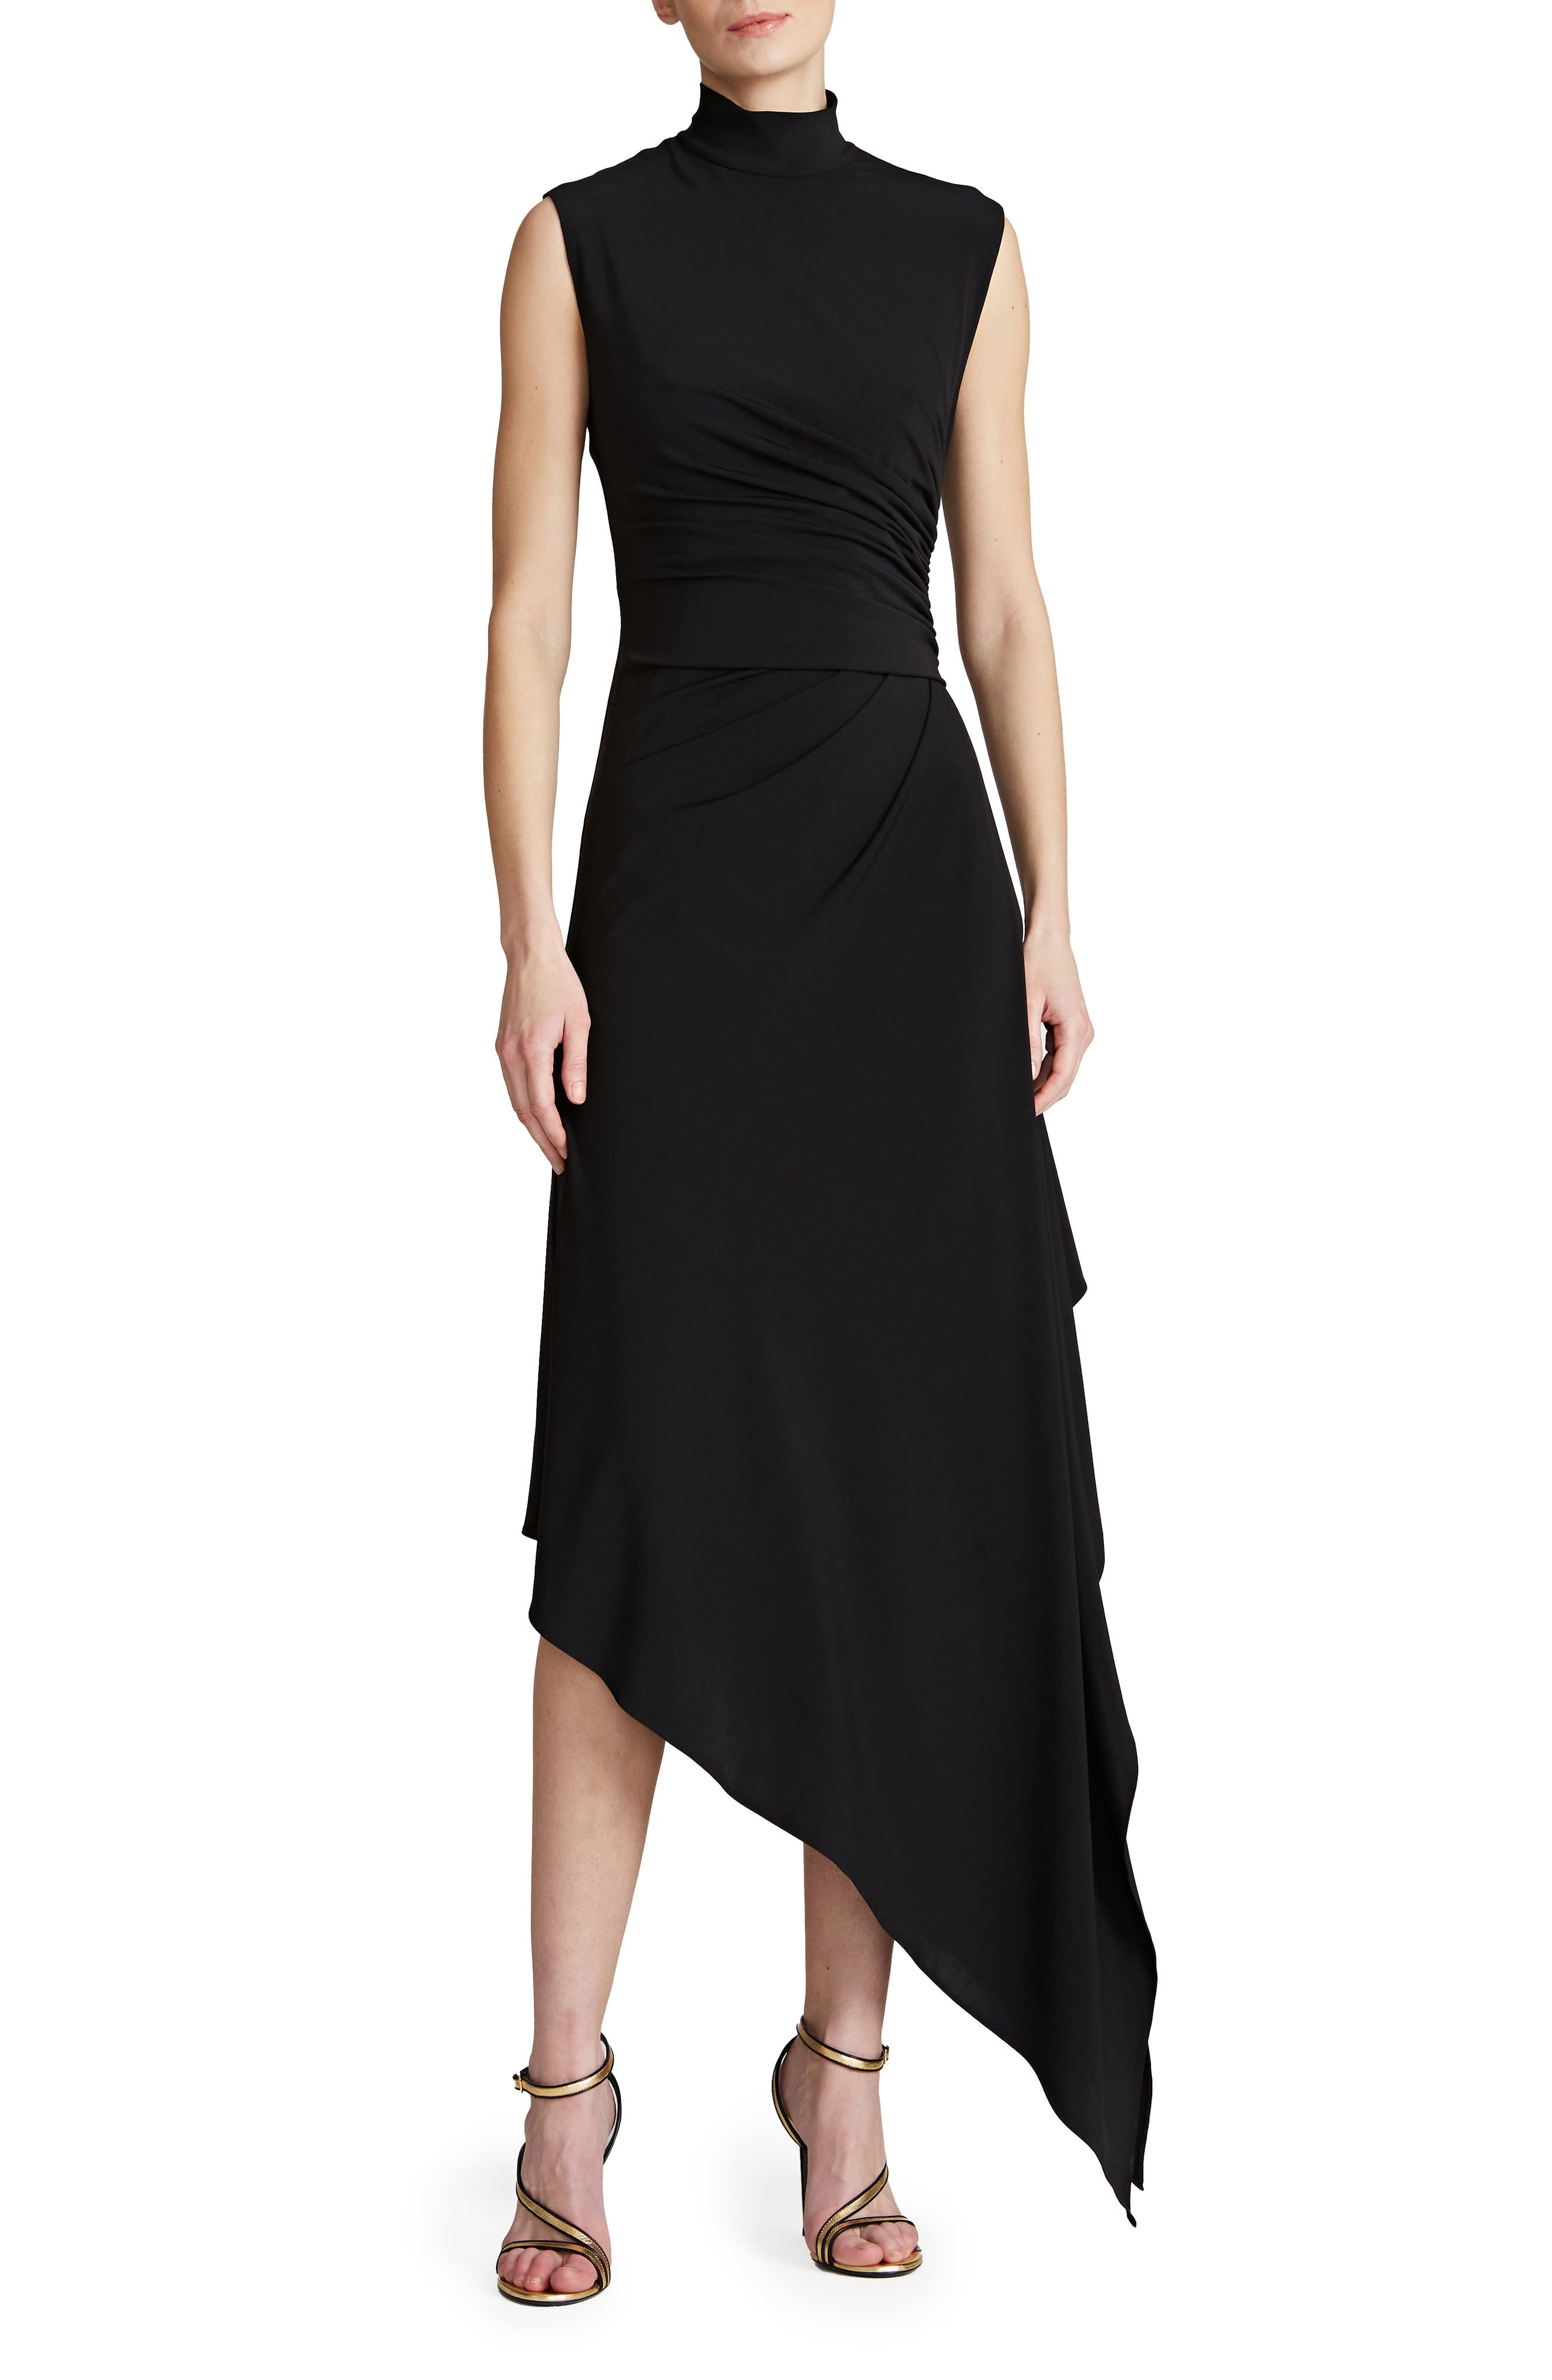 Layla Side Drape Asymmetric Jersey Cocktail Dress